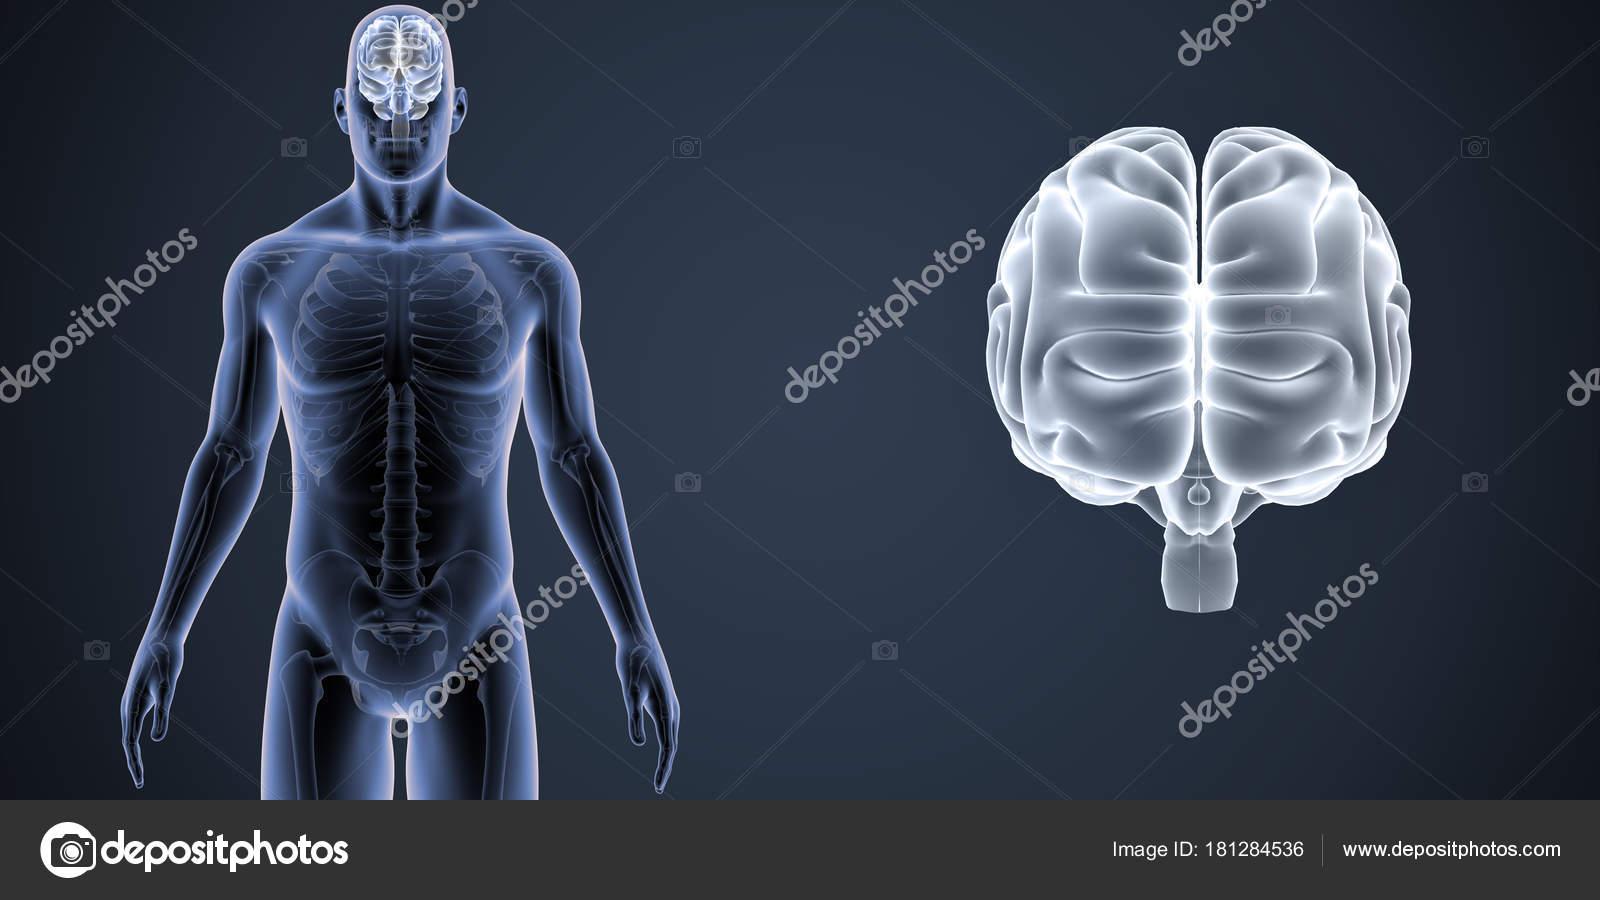 Human Brain Zoom Skeleton Body Anterior Illustration Dark